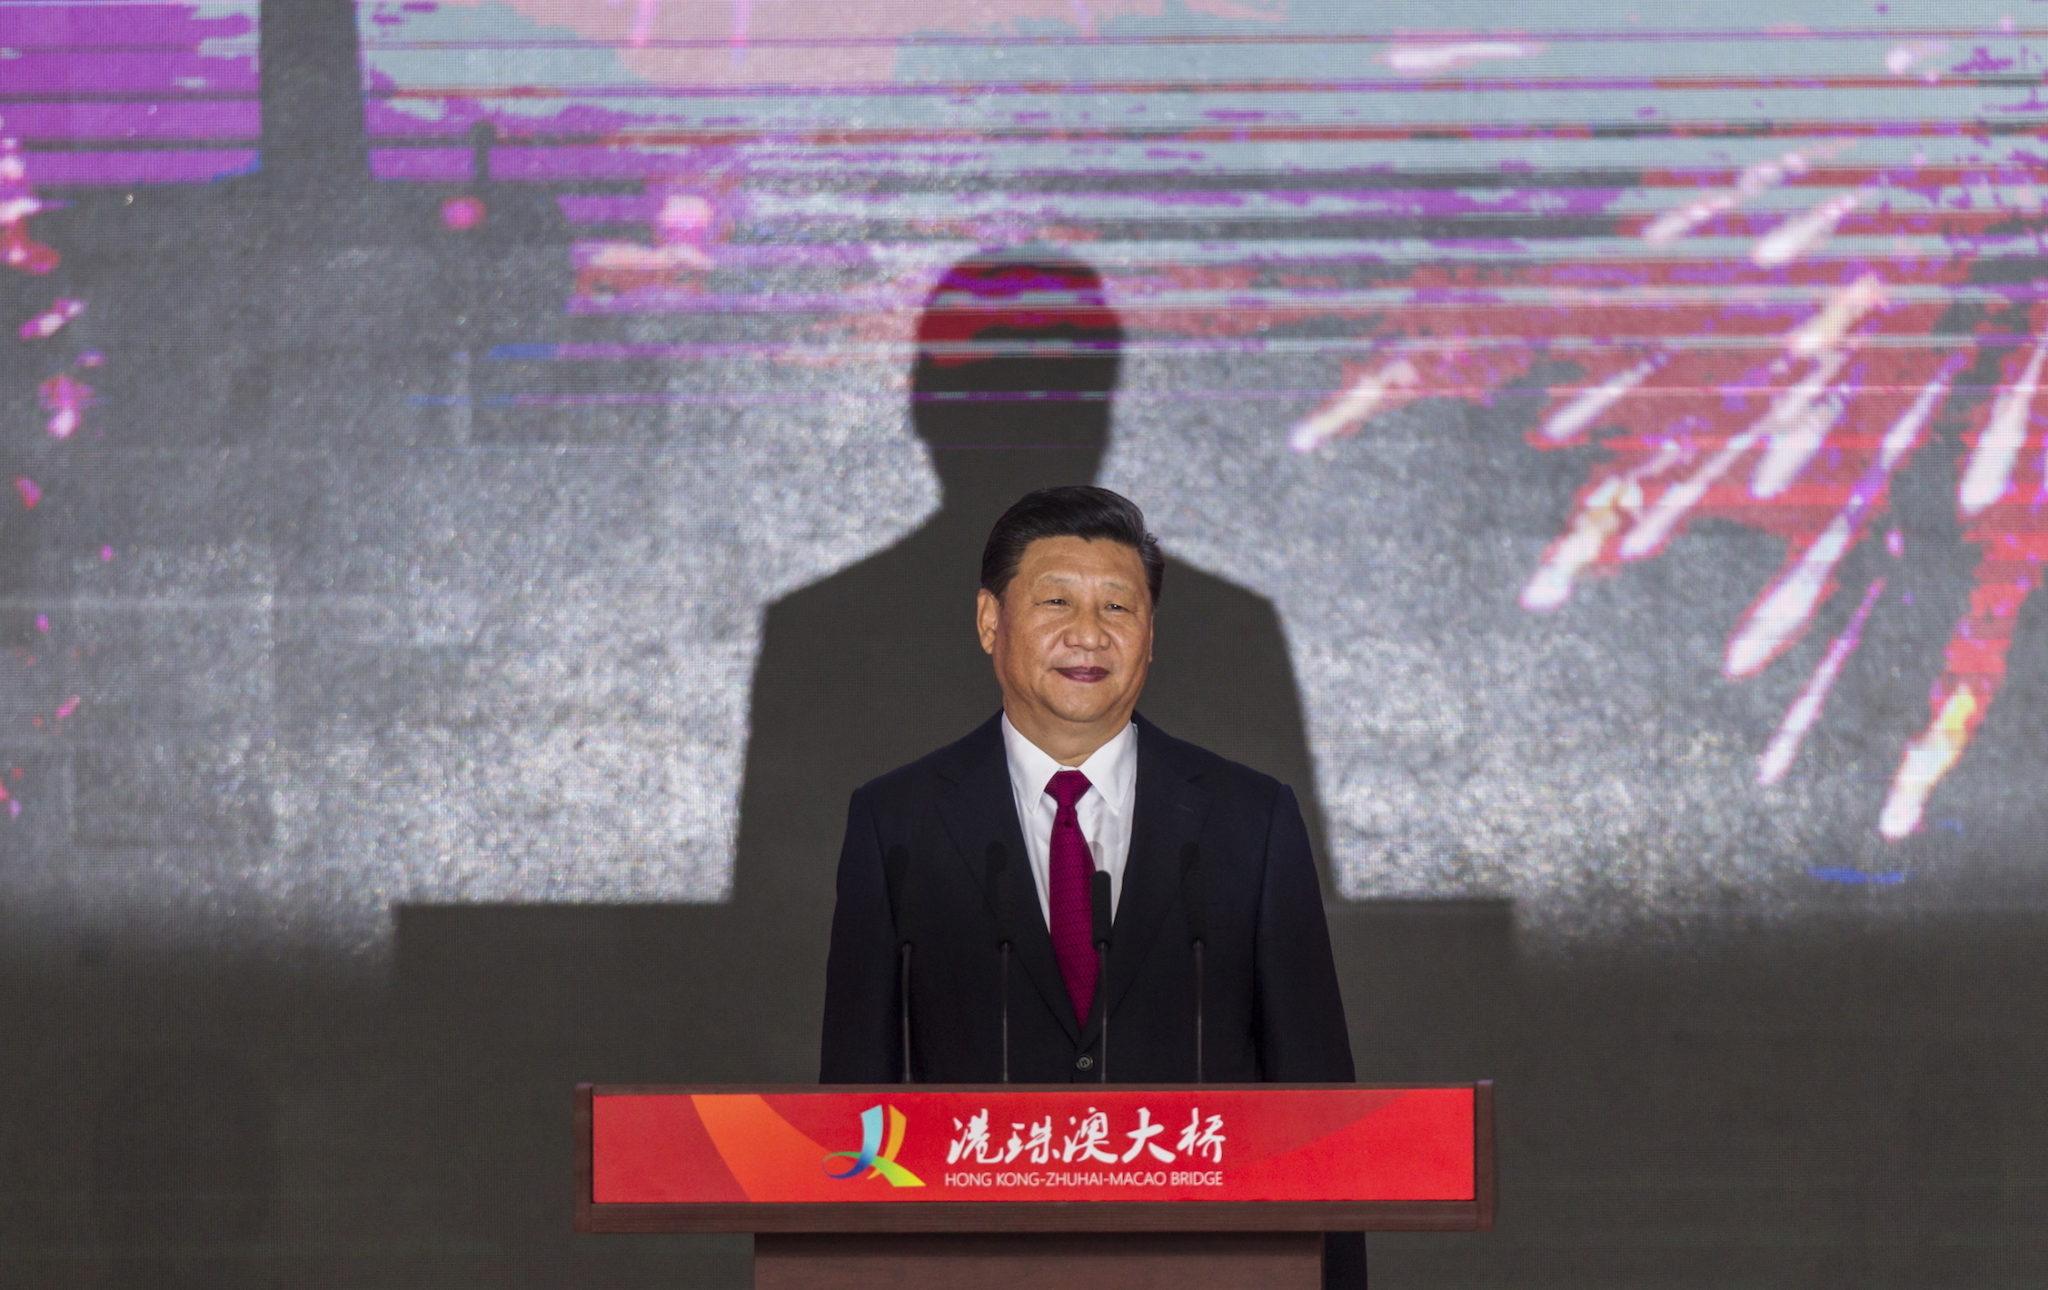 Vice-presidente brasileiro vai reunir-se com Xi Jinping durante visita à China